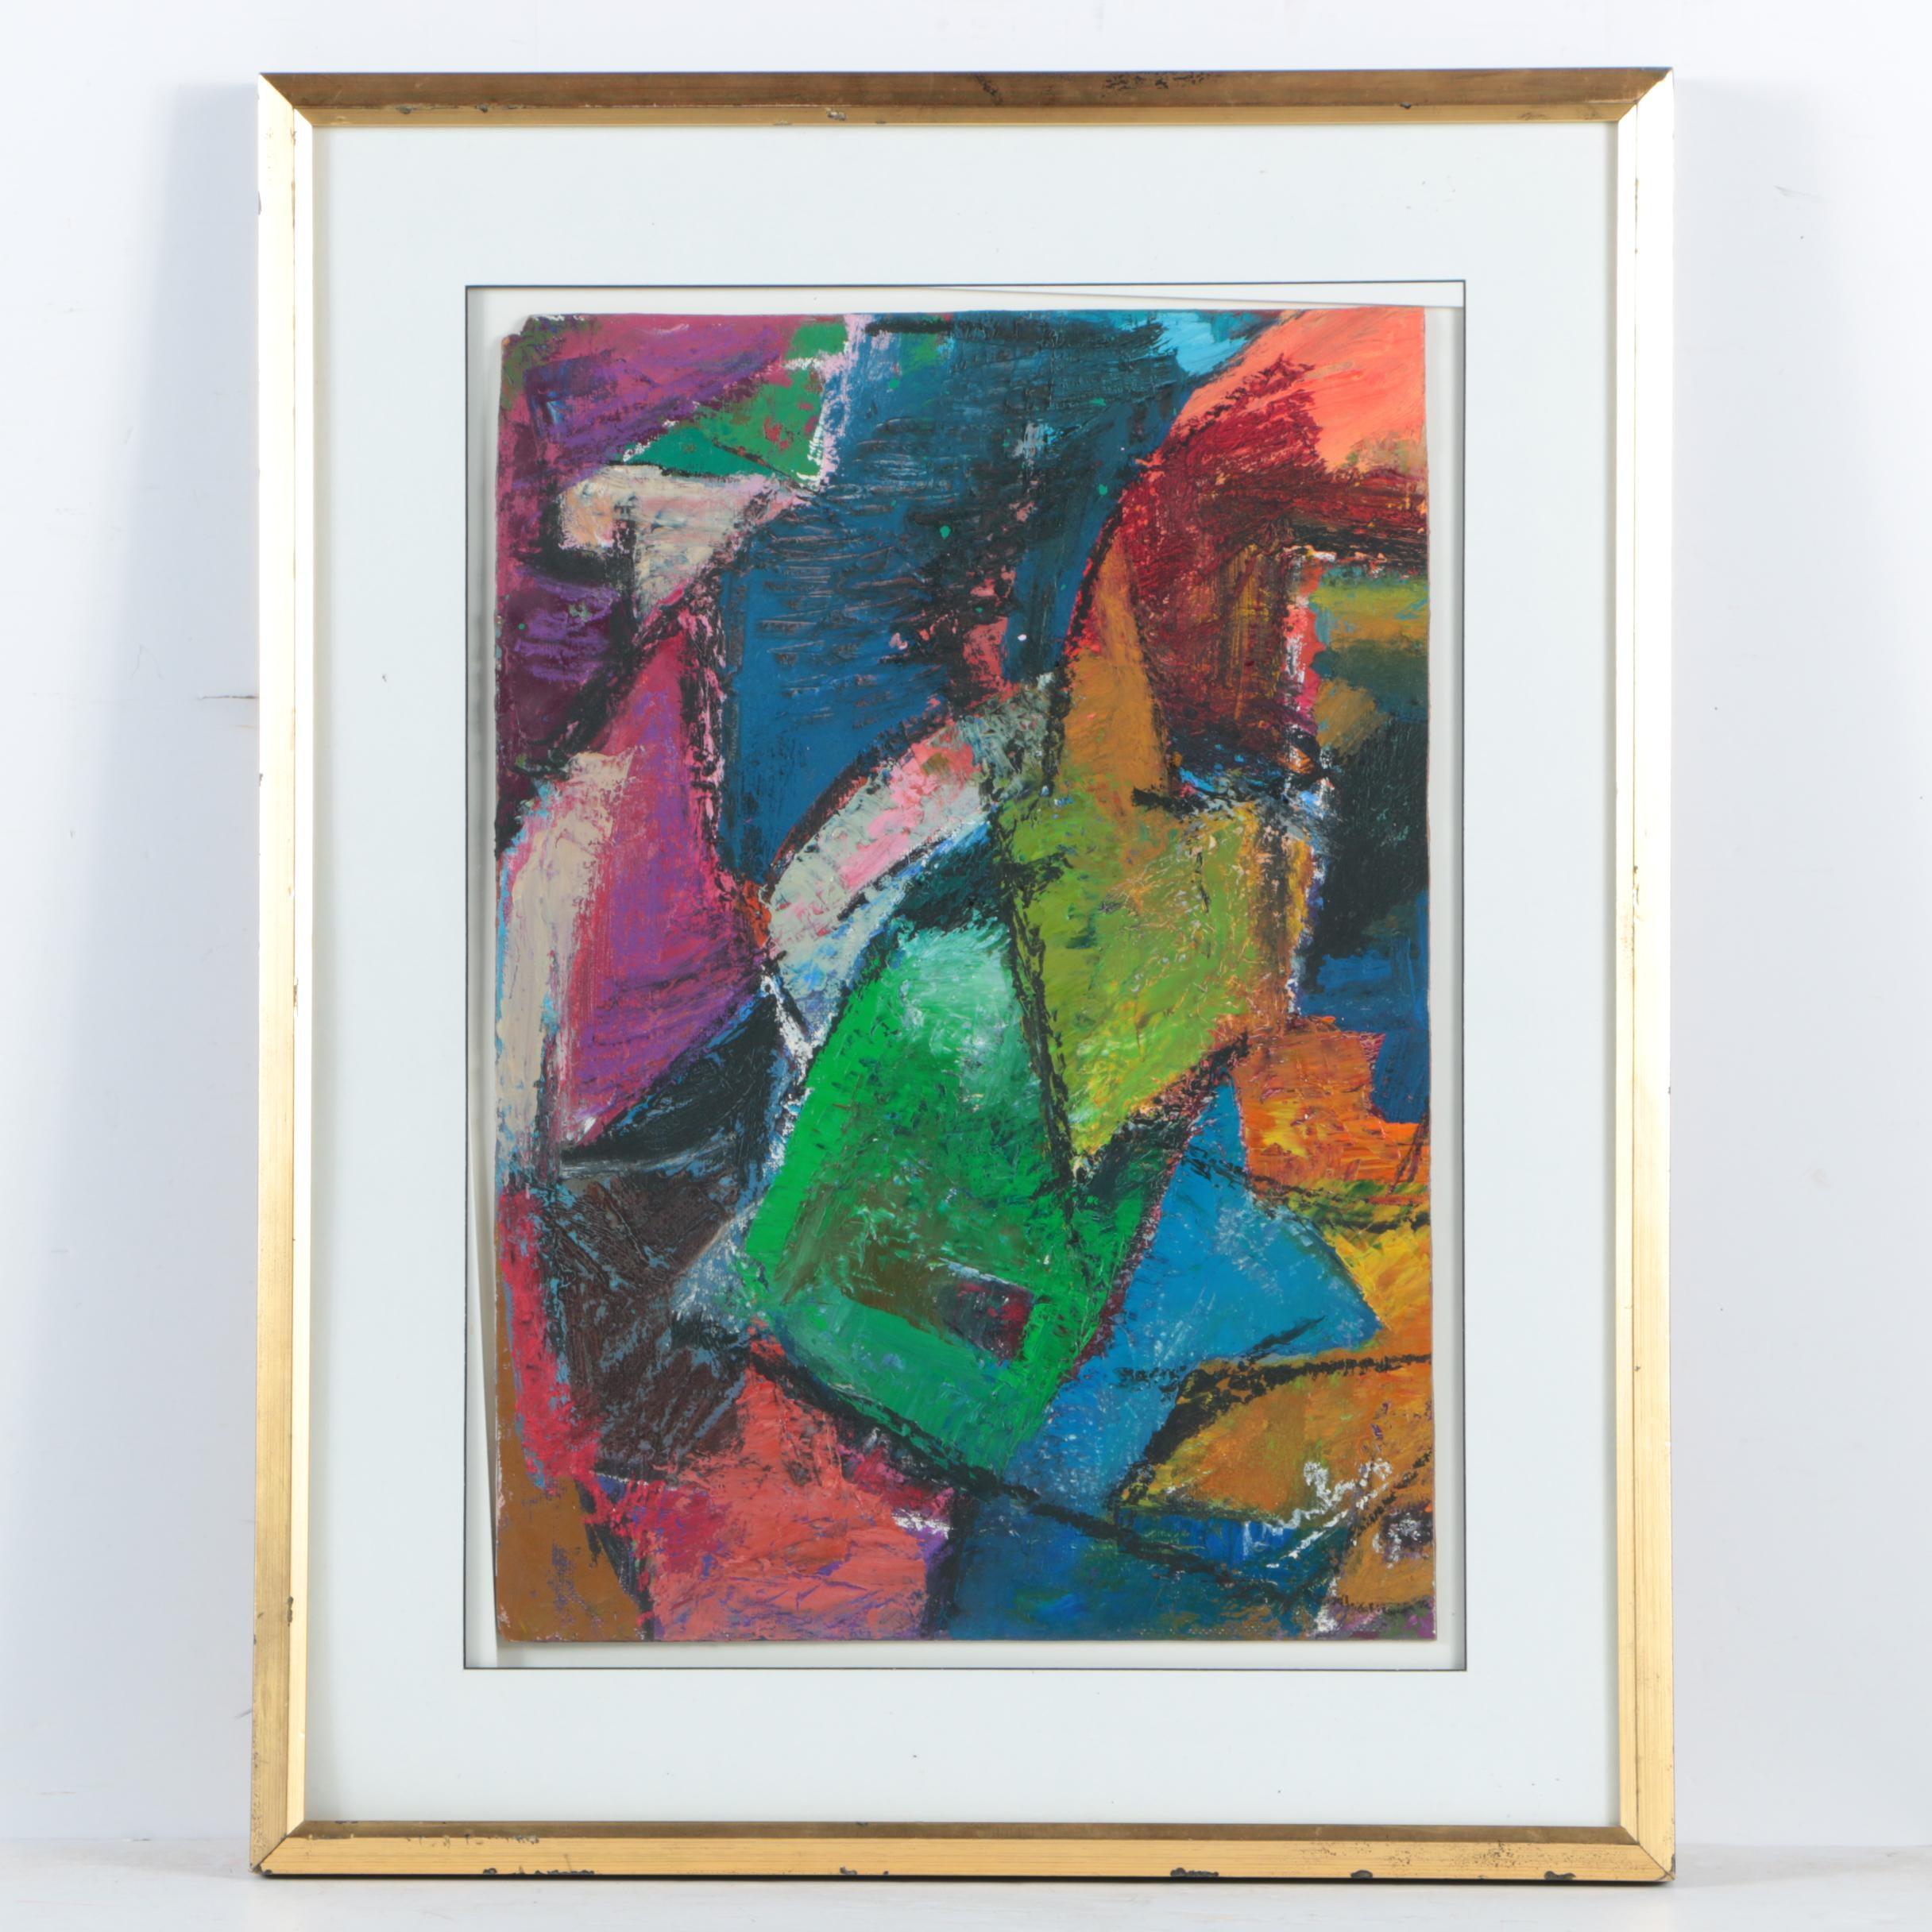 Ephraim Urevbu Acrylic Painting on Canvas Board